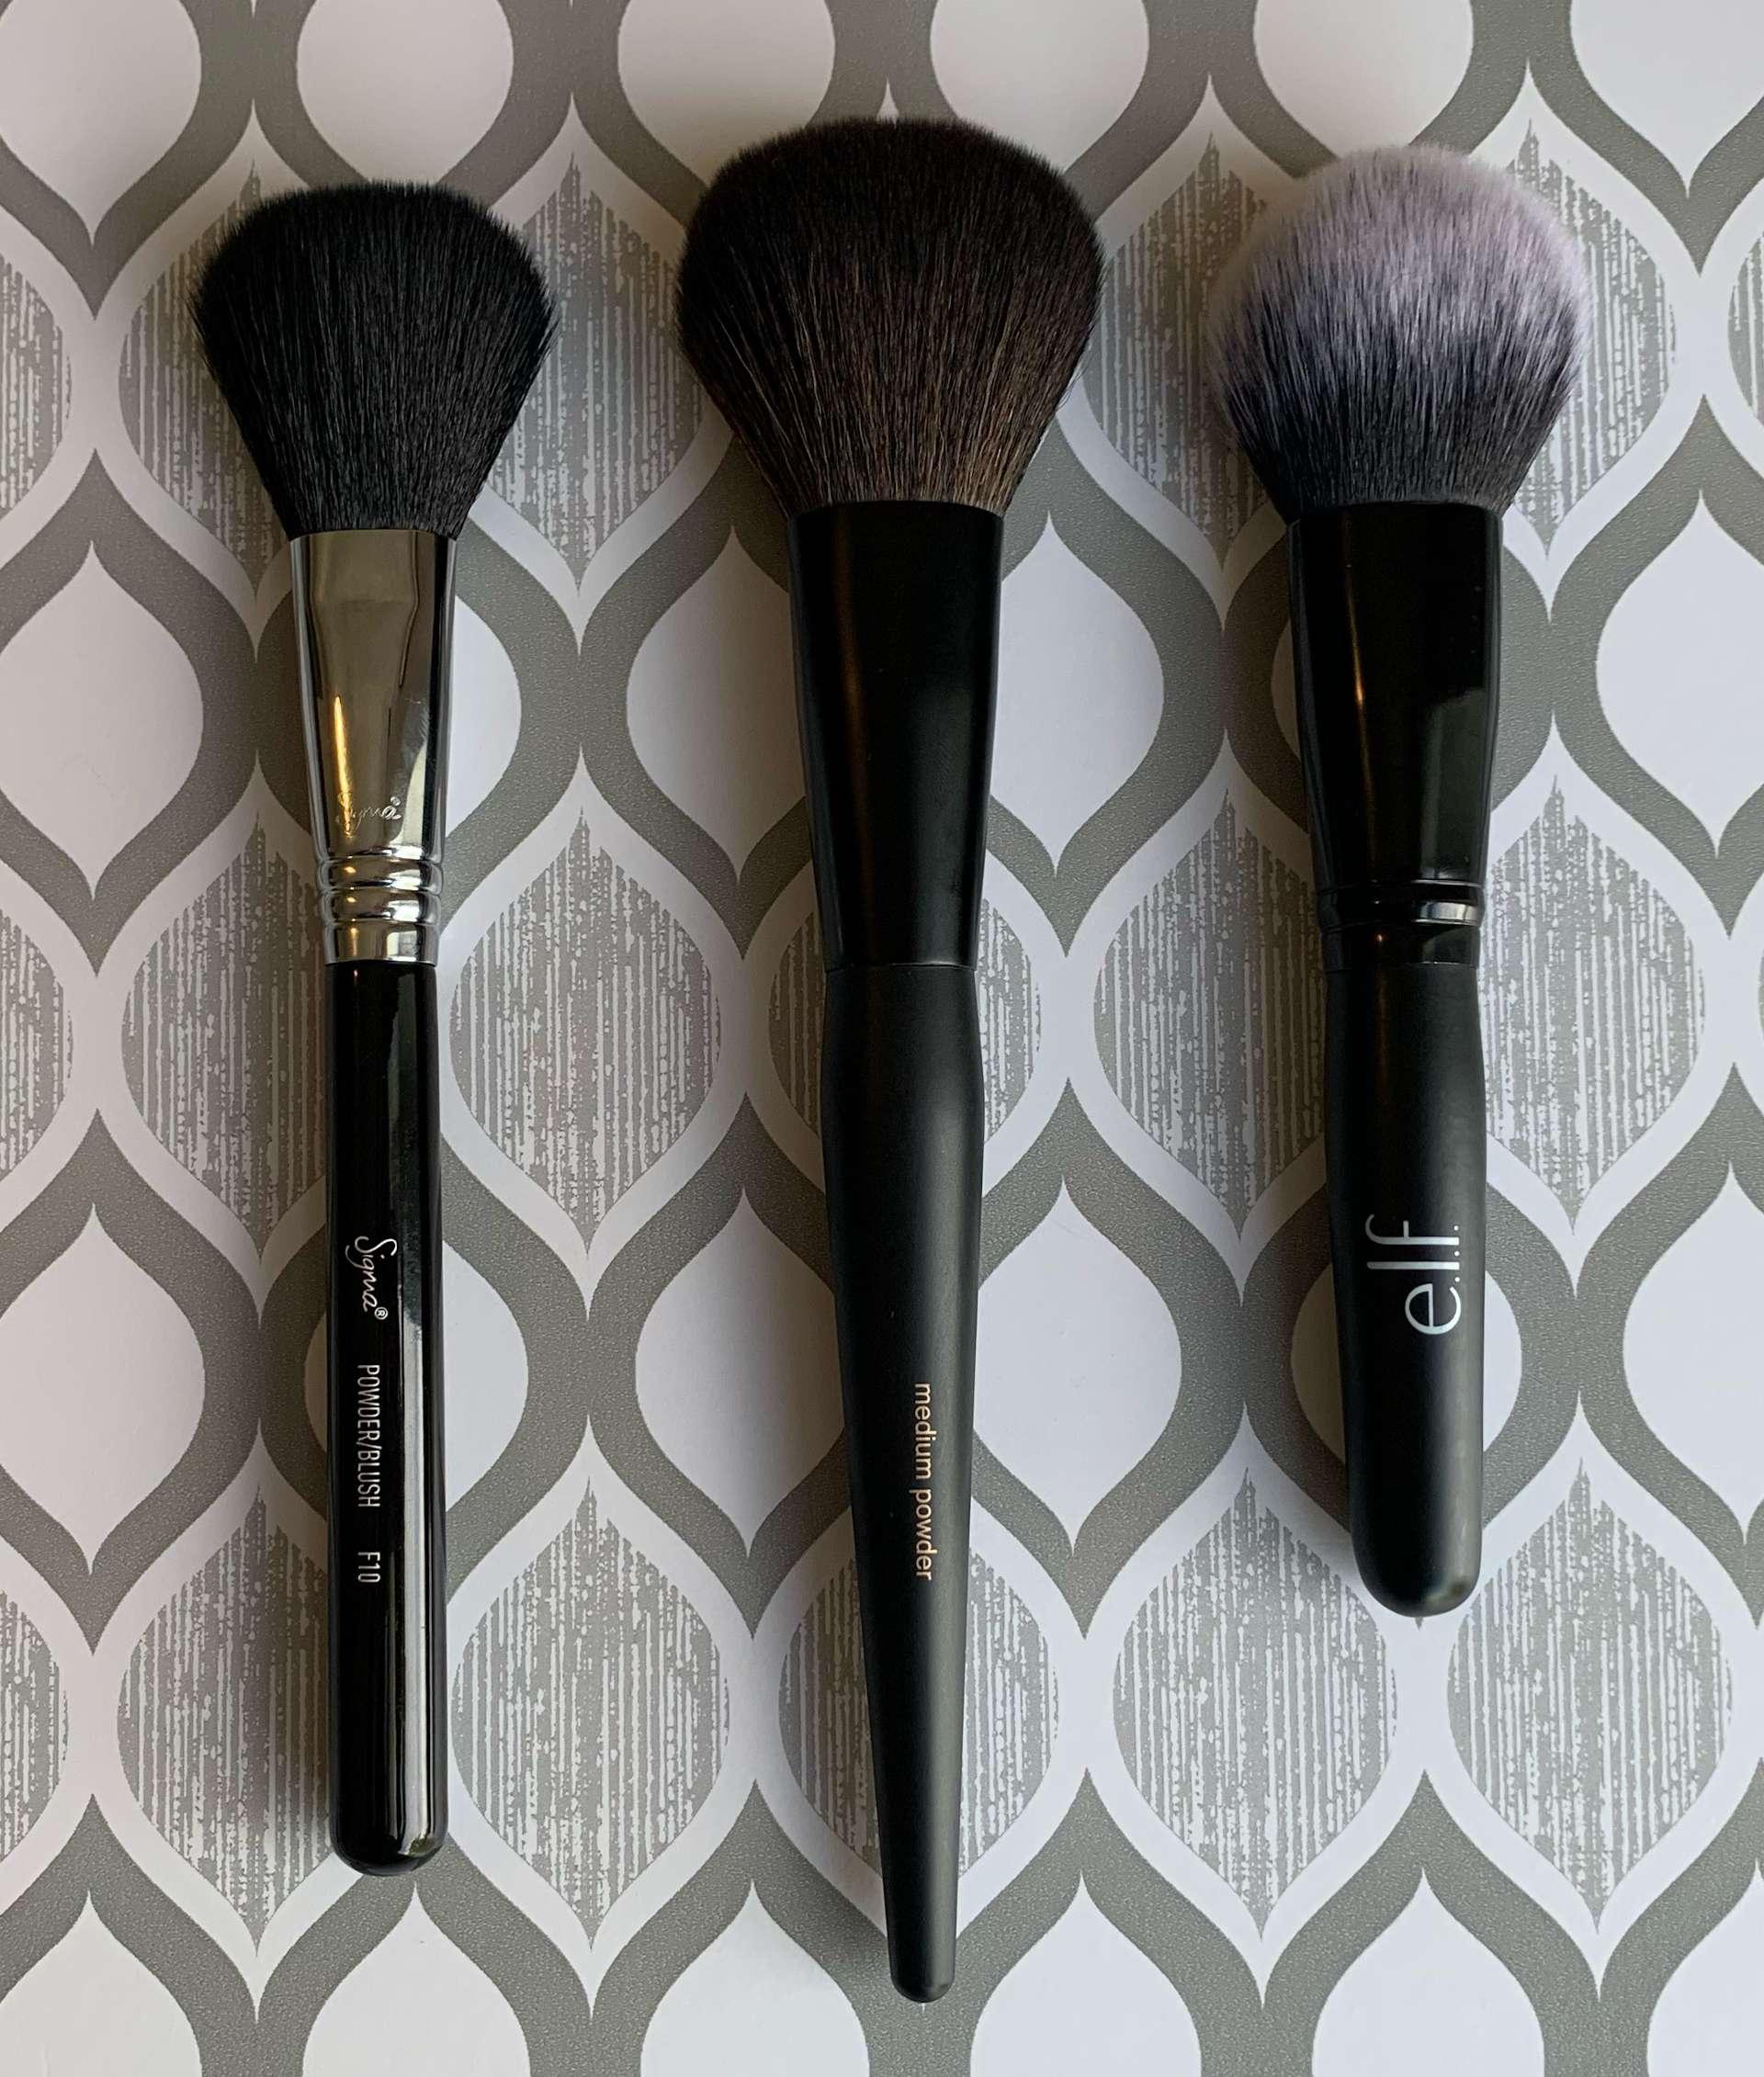 Sigma F10, Sonia Kashuk medium powder, e.l.f. flawless face brush